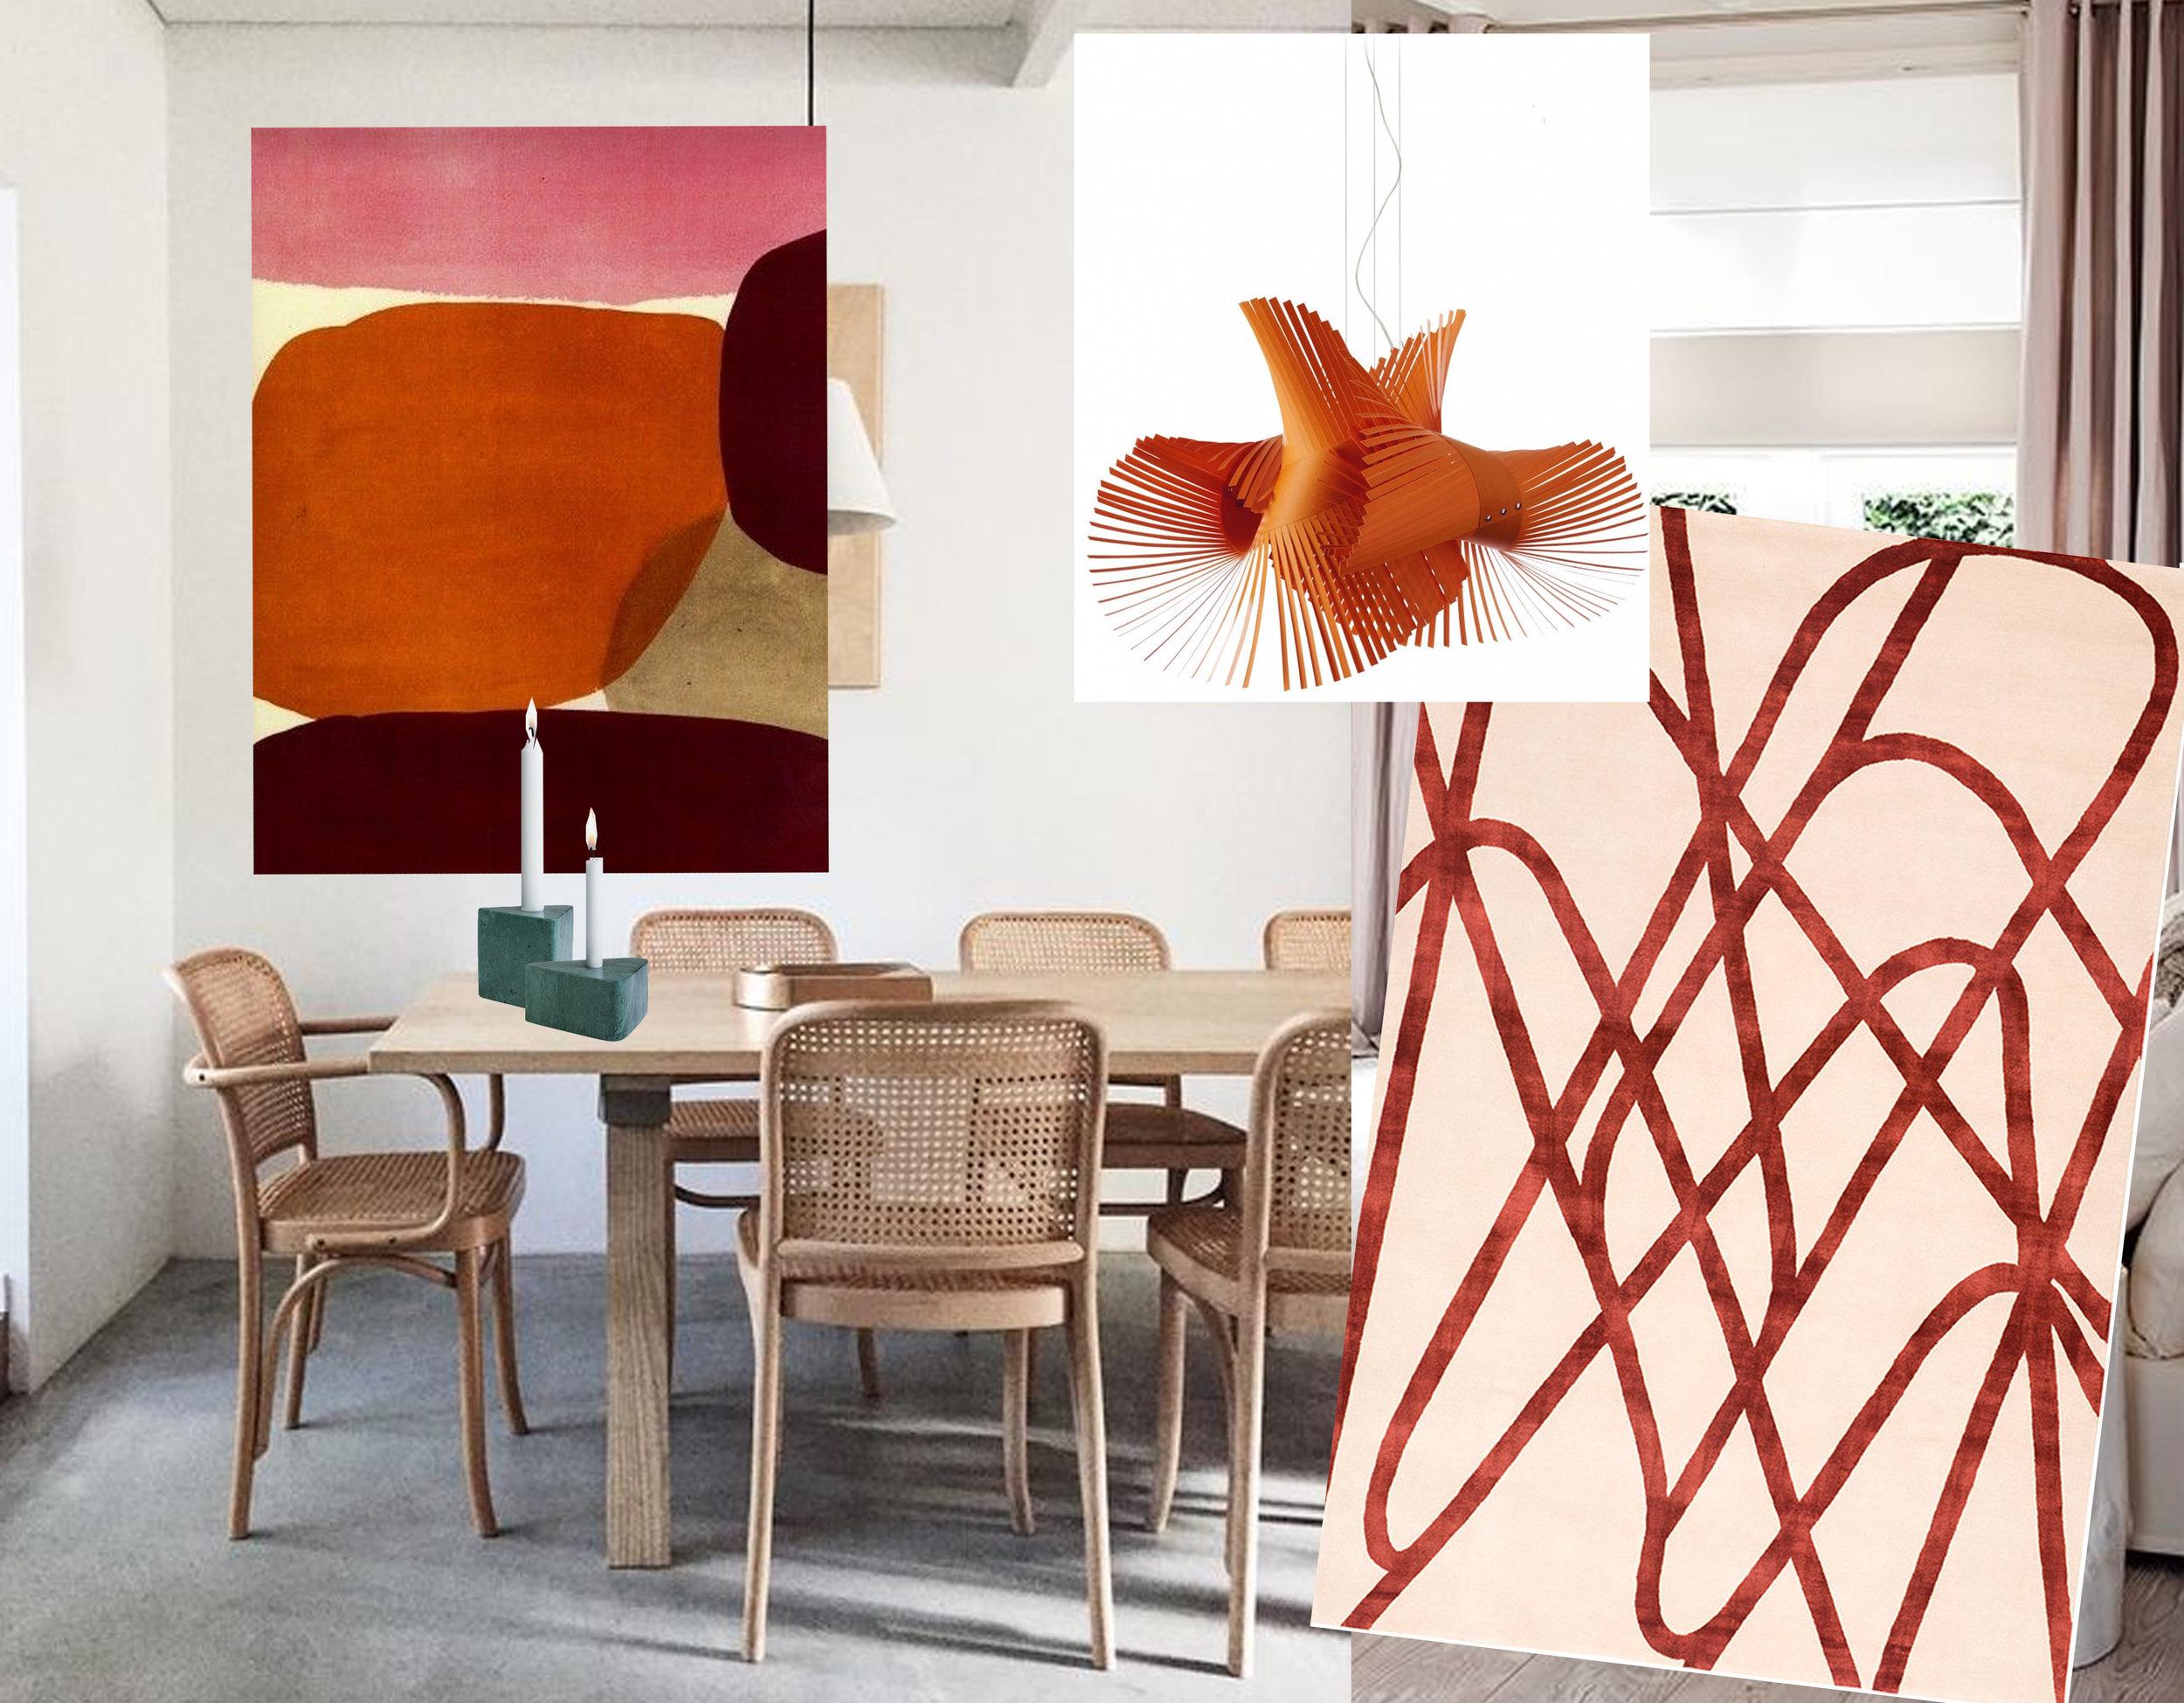 artwork  Luli Sanchez  - candleholders  Bolia  - interior image via Instagram - rug Farrah Ruby  The Rugcompany  - Minimikado suspension Lamp  Milia Shop